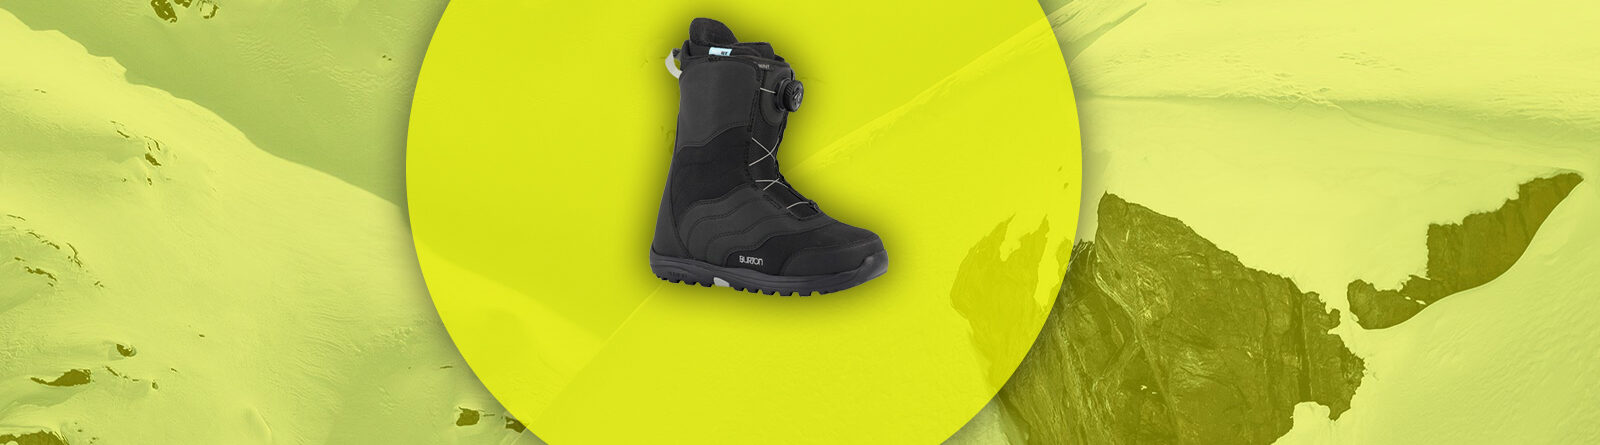 c4ec50e7bb9 Burton Mint Boa Snowboard Boots - Women s 2019